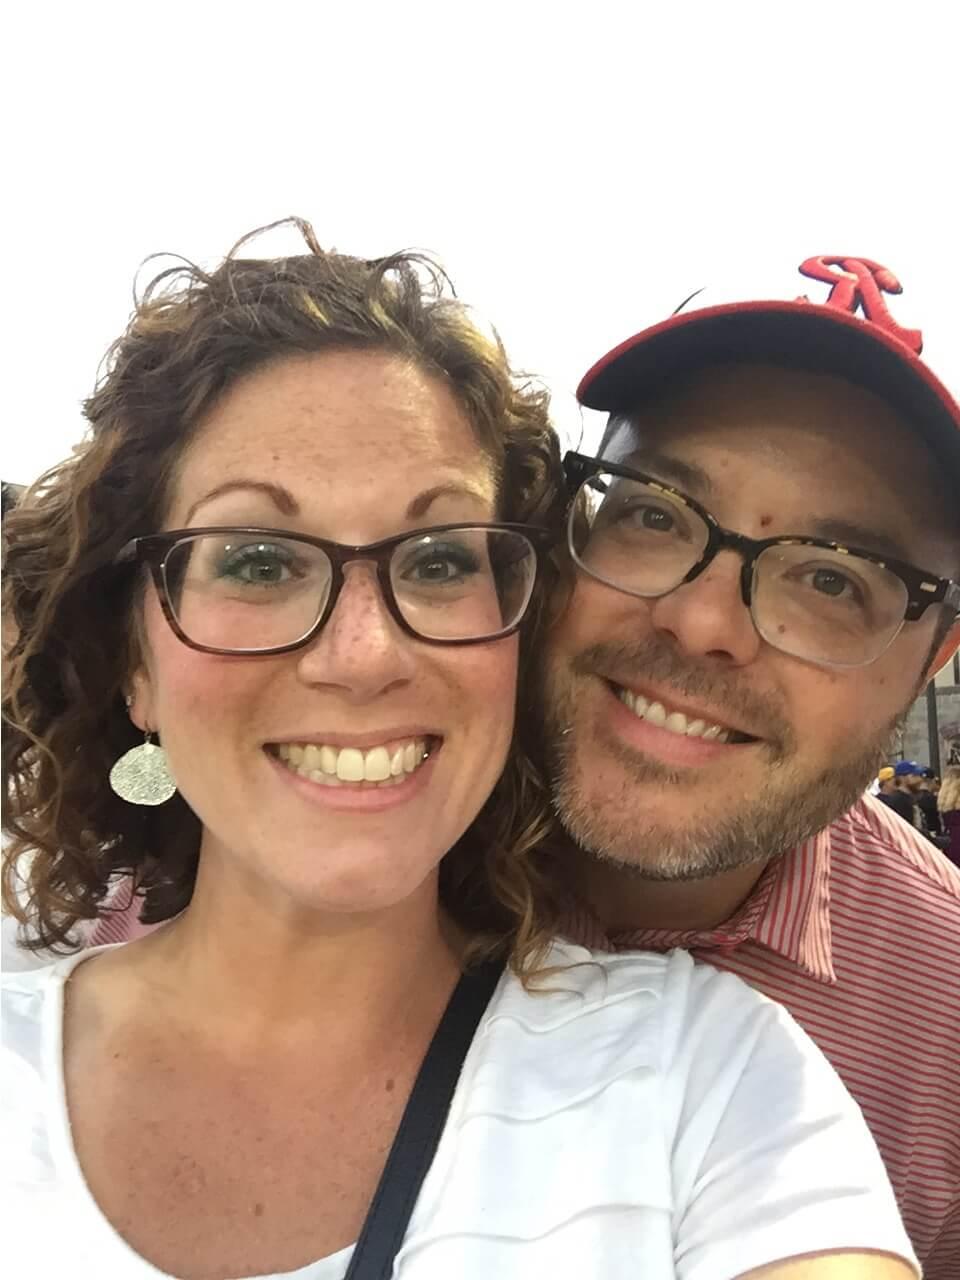 Educator Cara Rager loves discovering Rochester's hidden gems